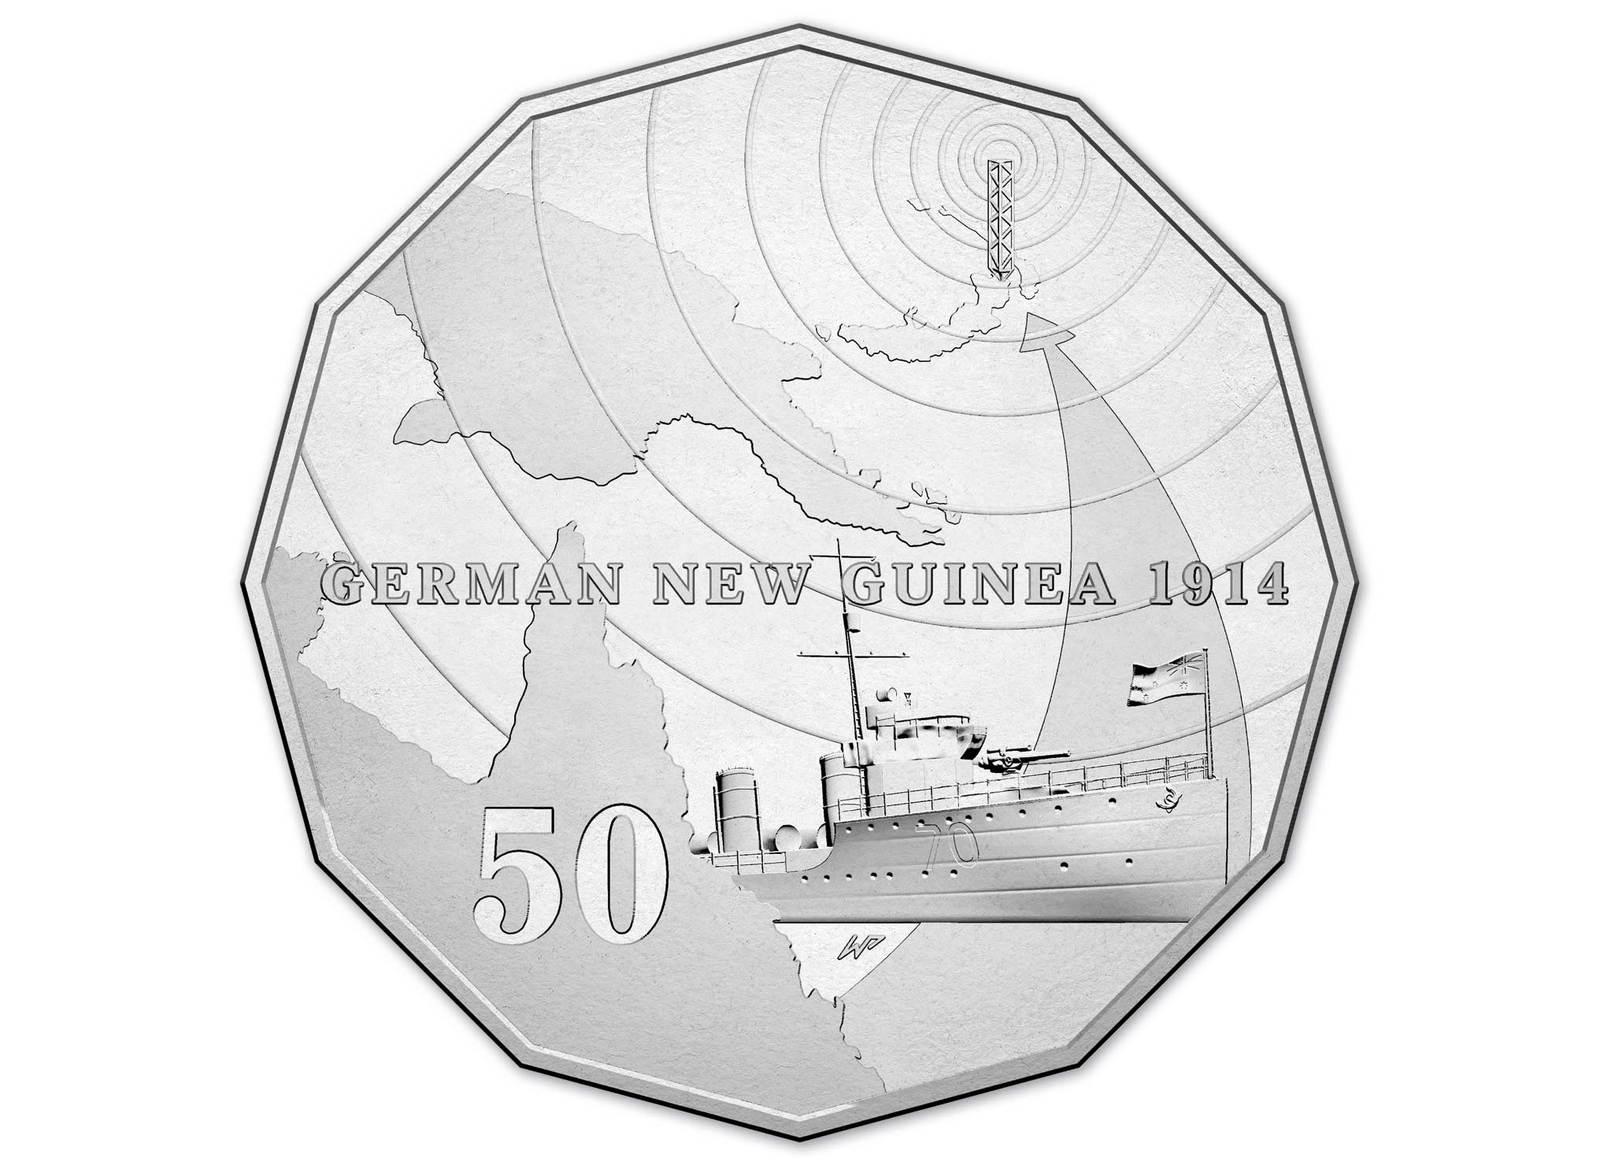 2014 Australia at War Series German New Guinea 1914-50c Coin